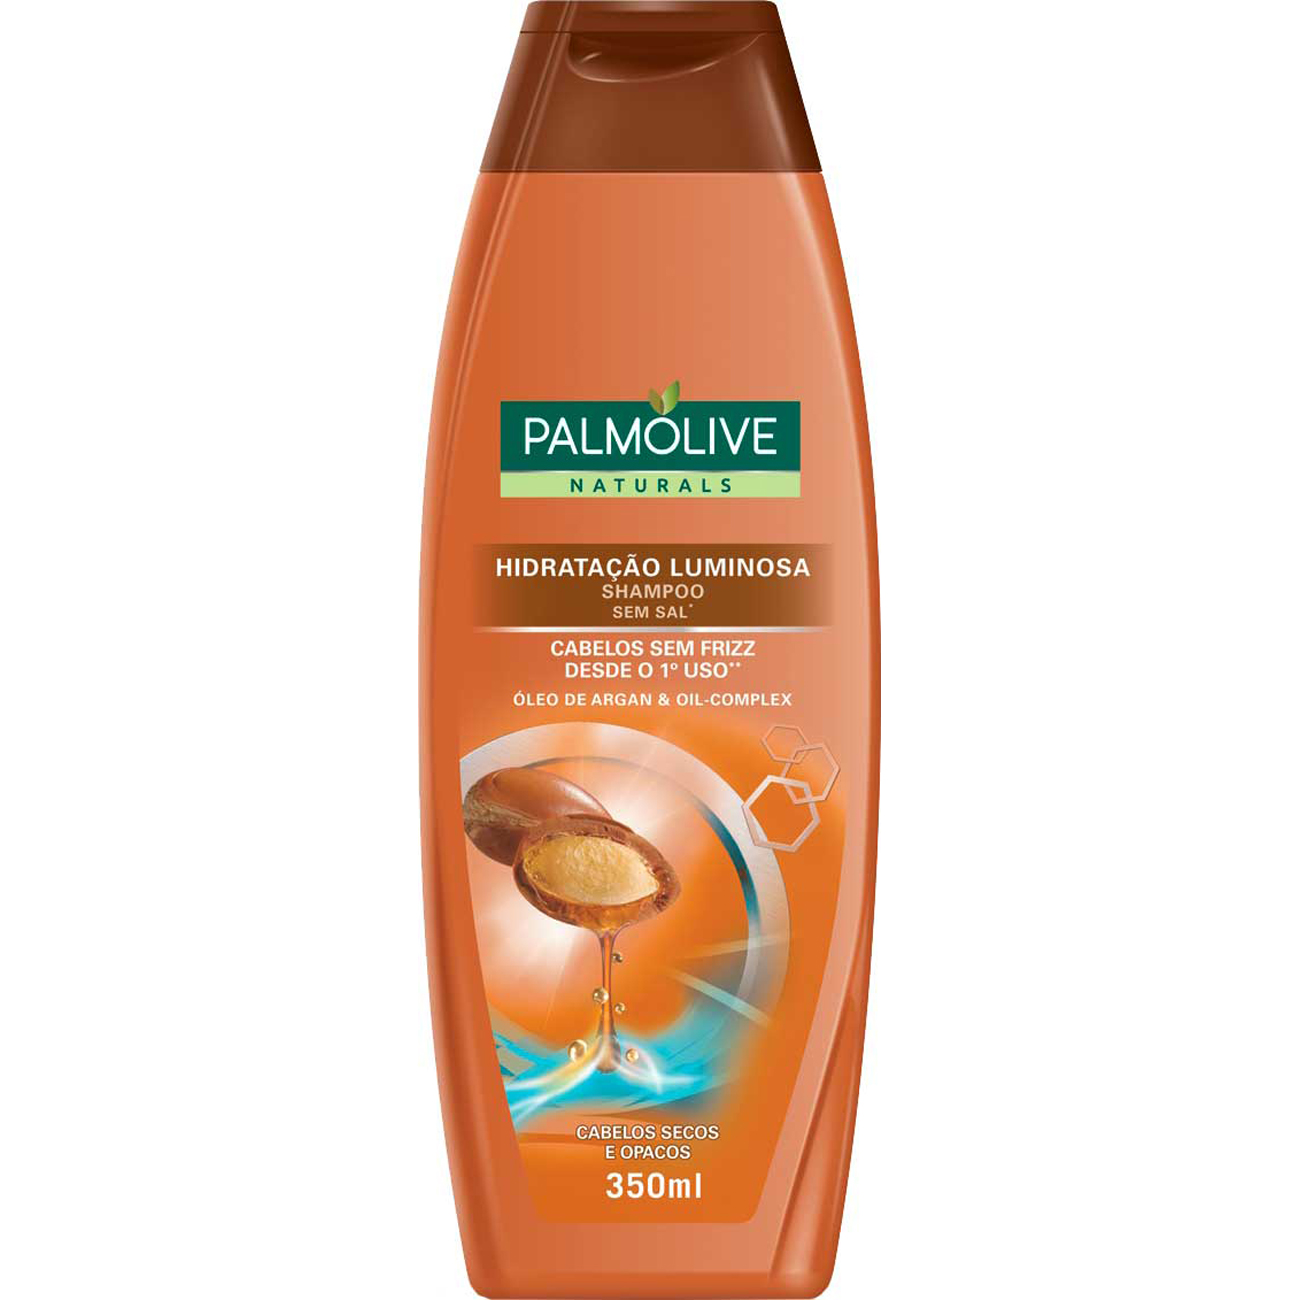 Shampoo Palmolive Naturals Hidratacao Luminosa 350Ml